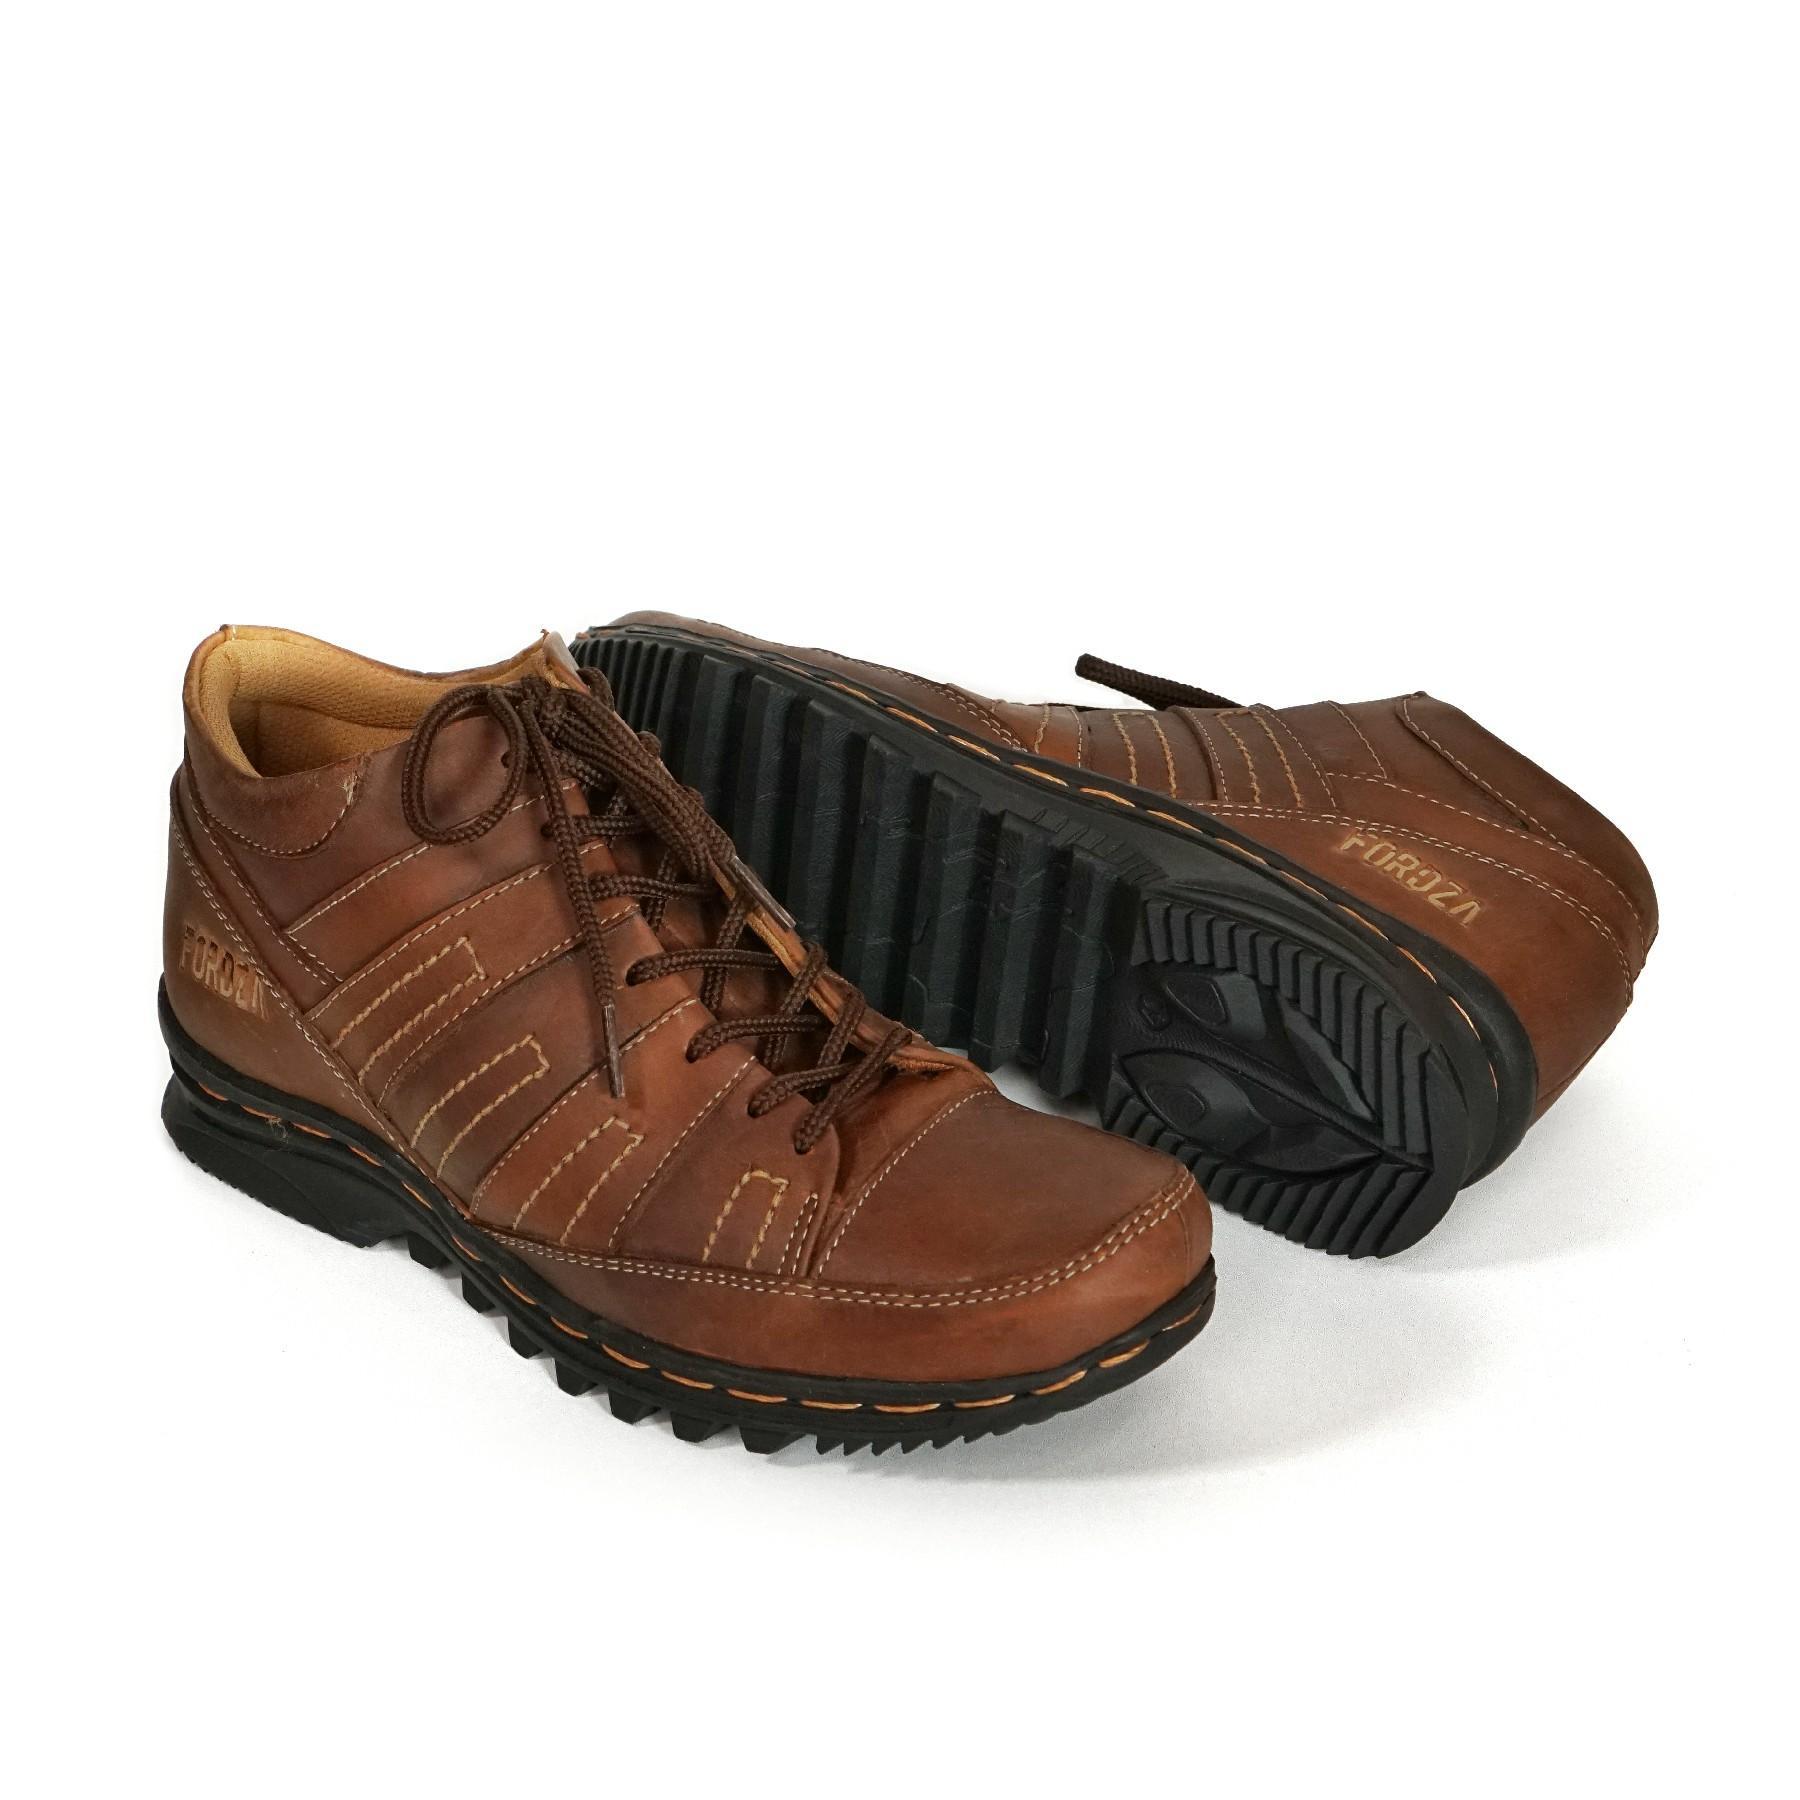 sepatu boots pria casual kulit asli handmade sol karet model fordza boots 901dr